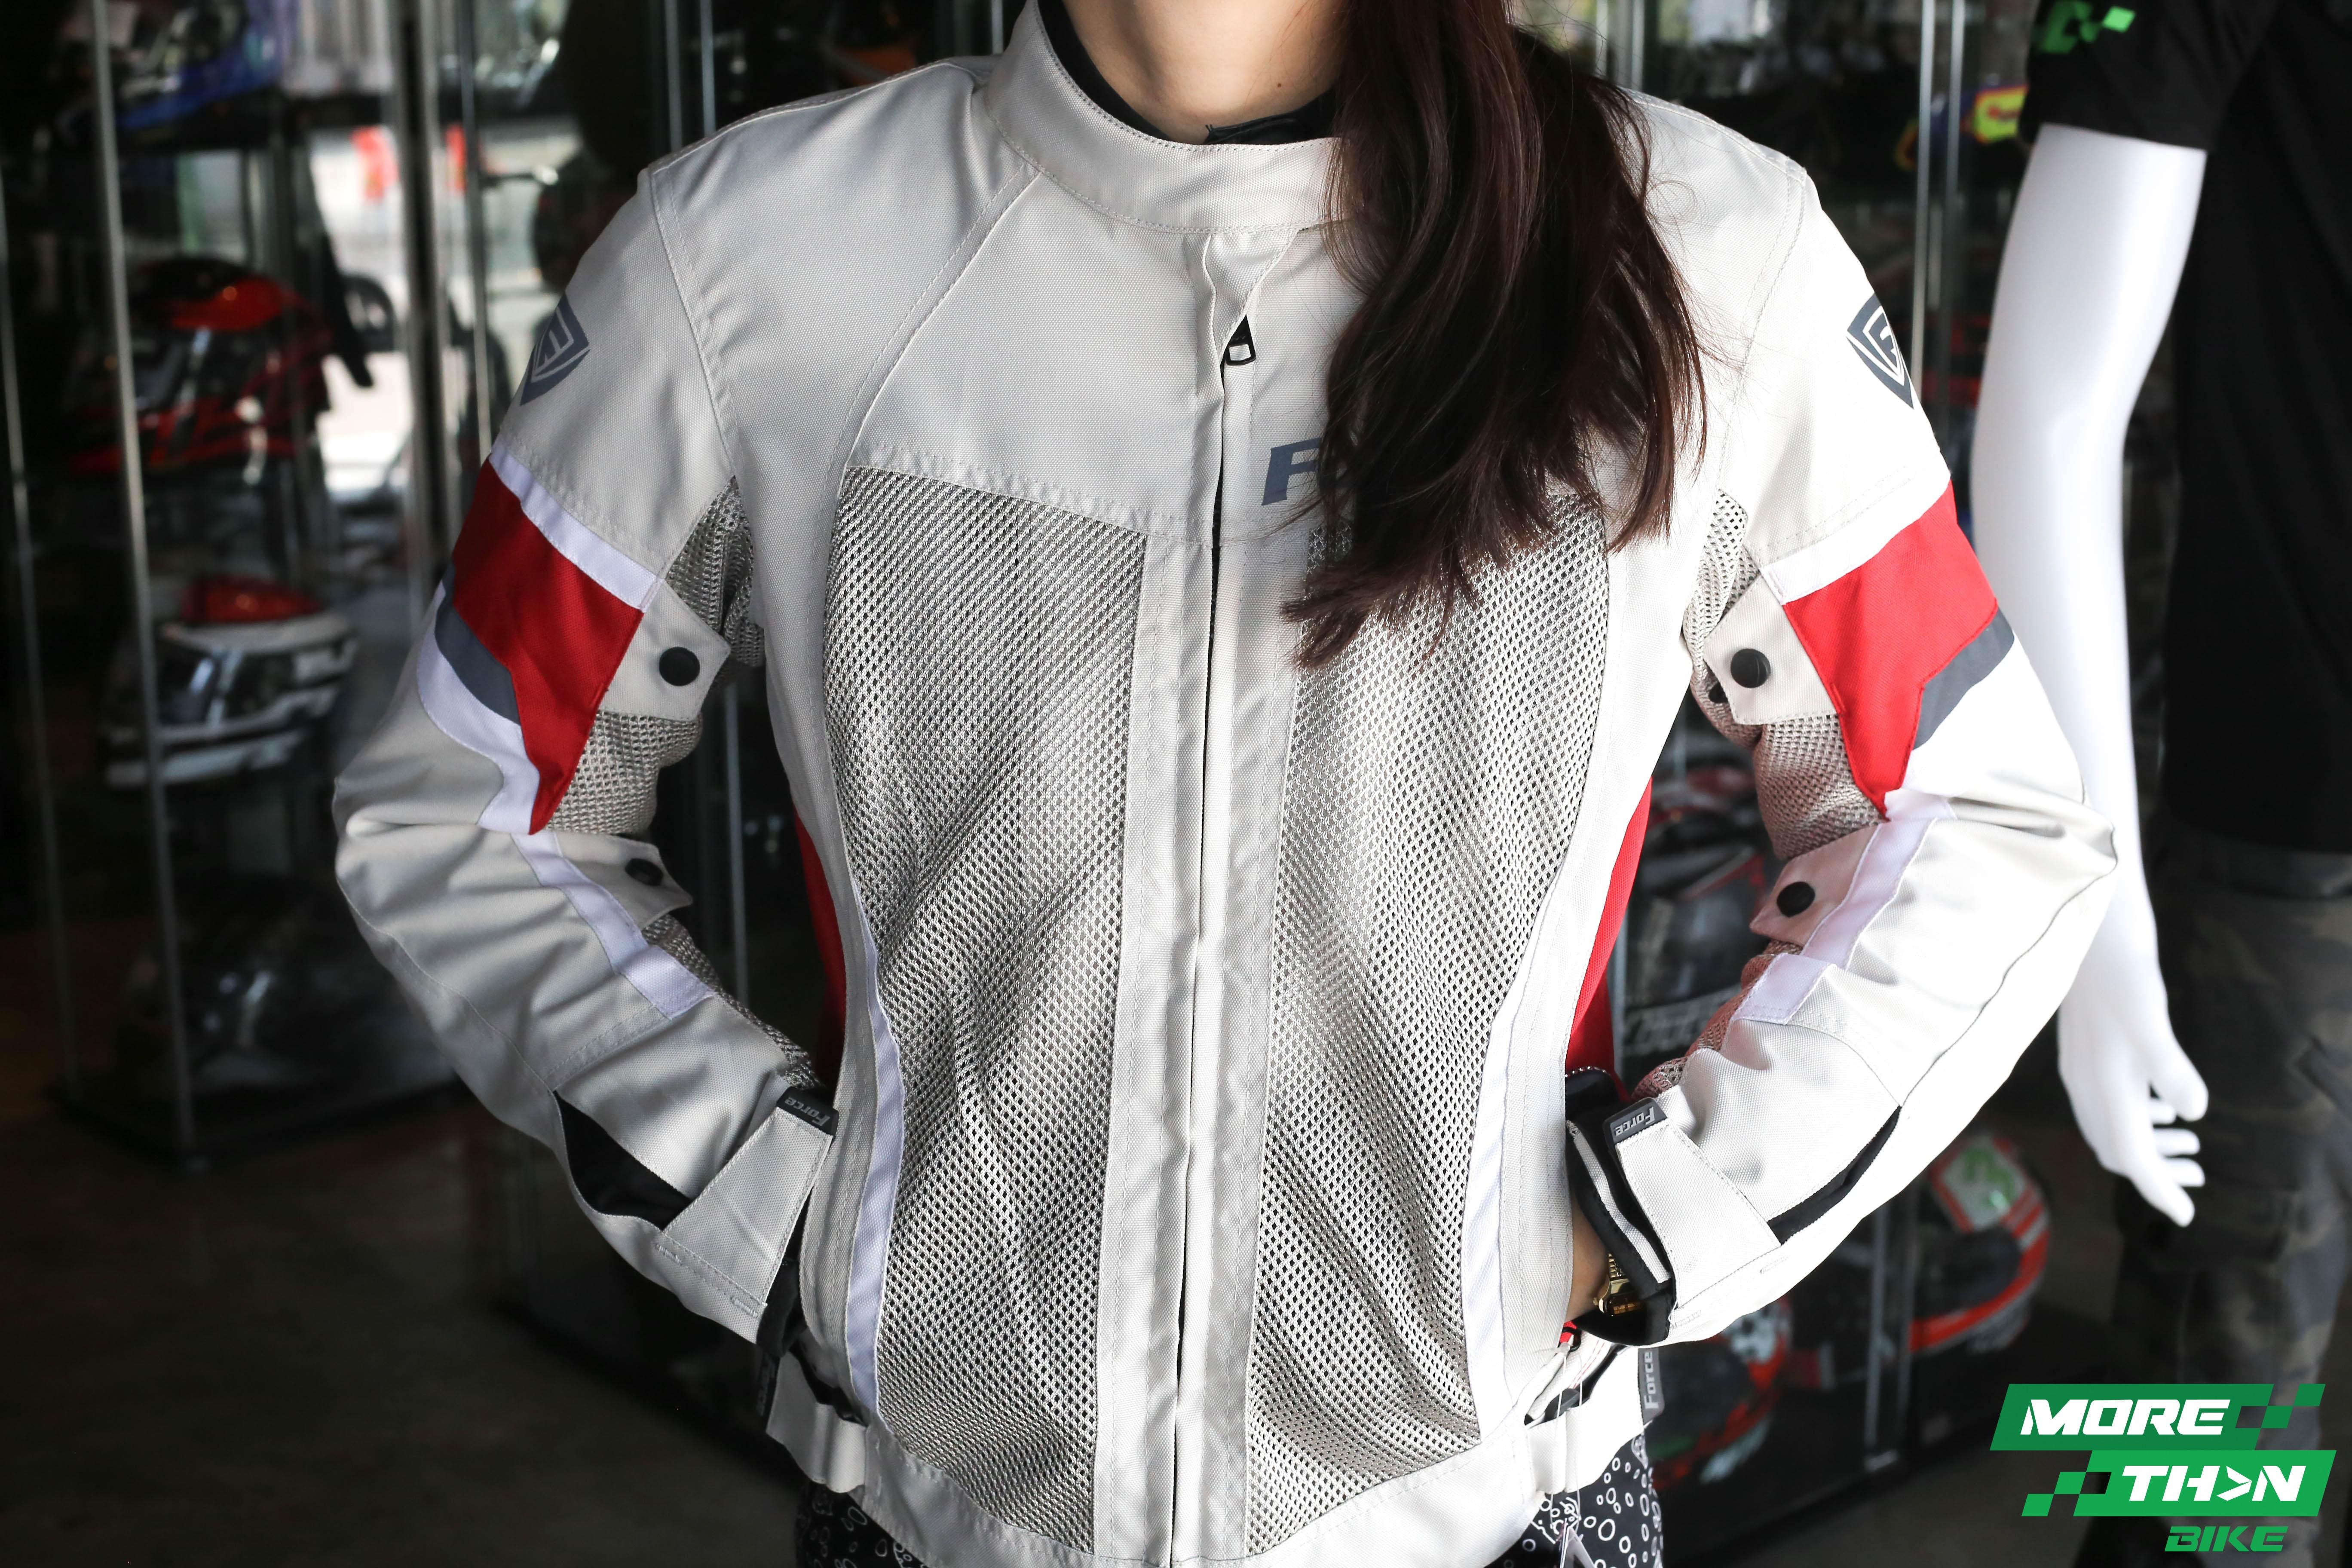 force-viena-white-jacket3